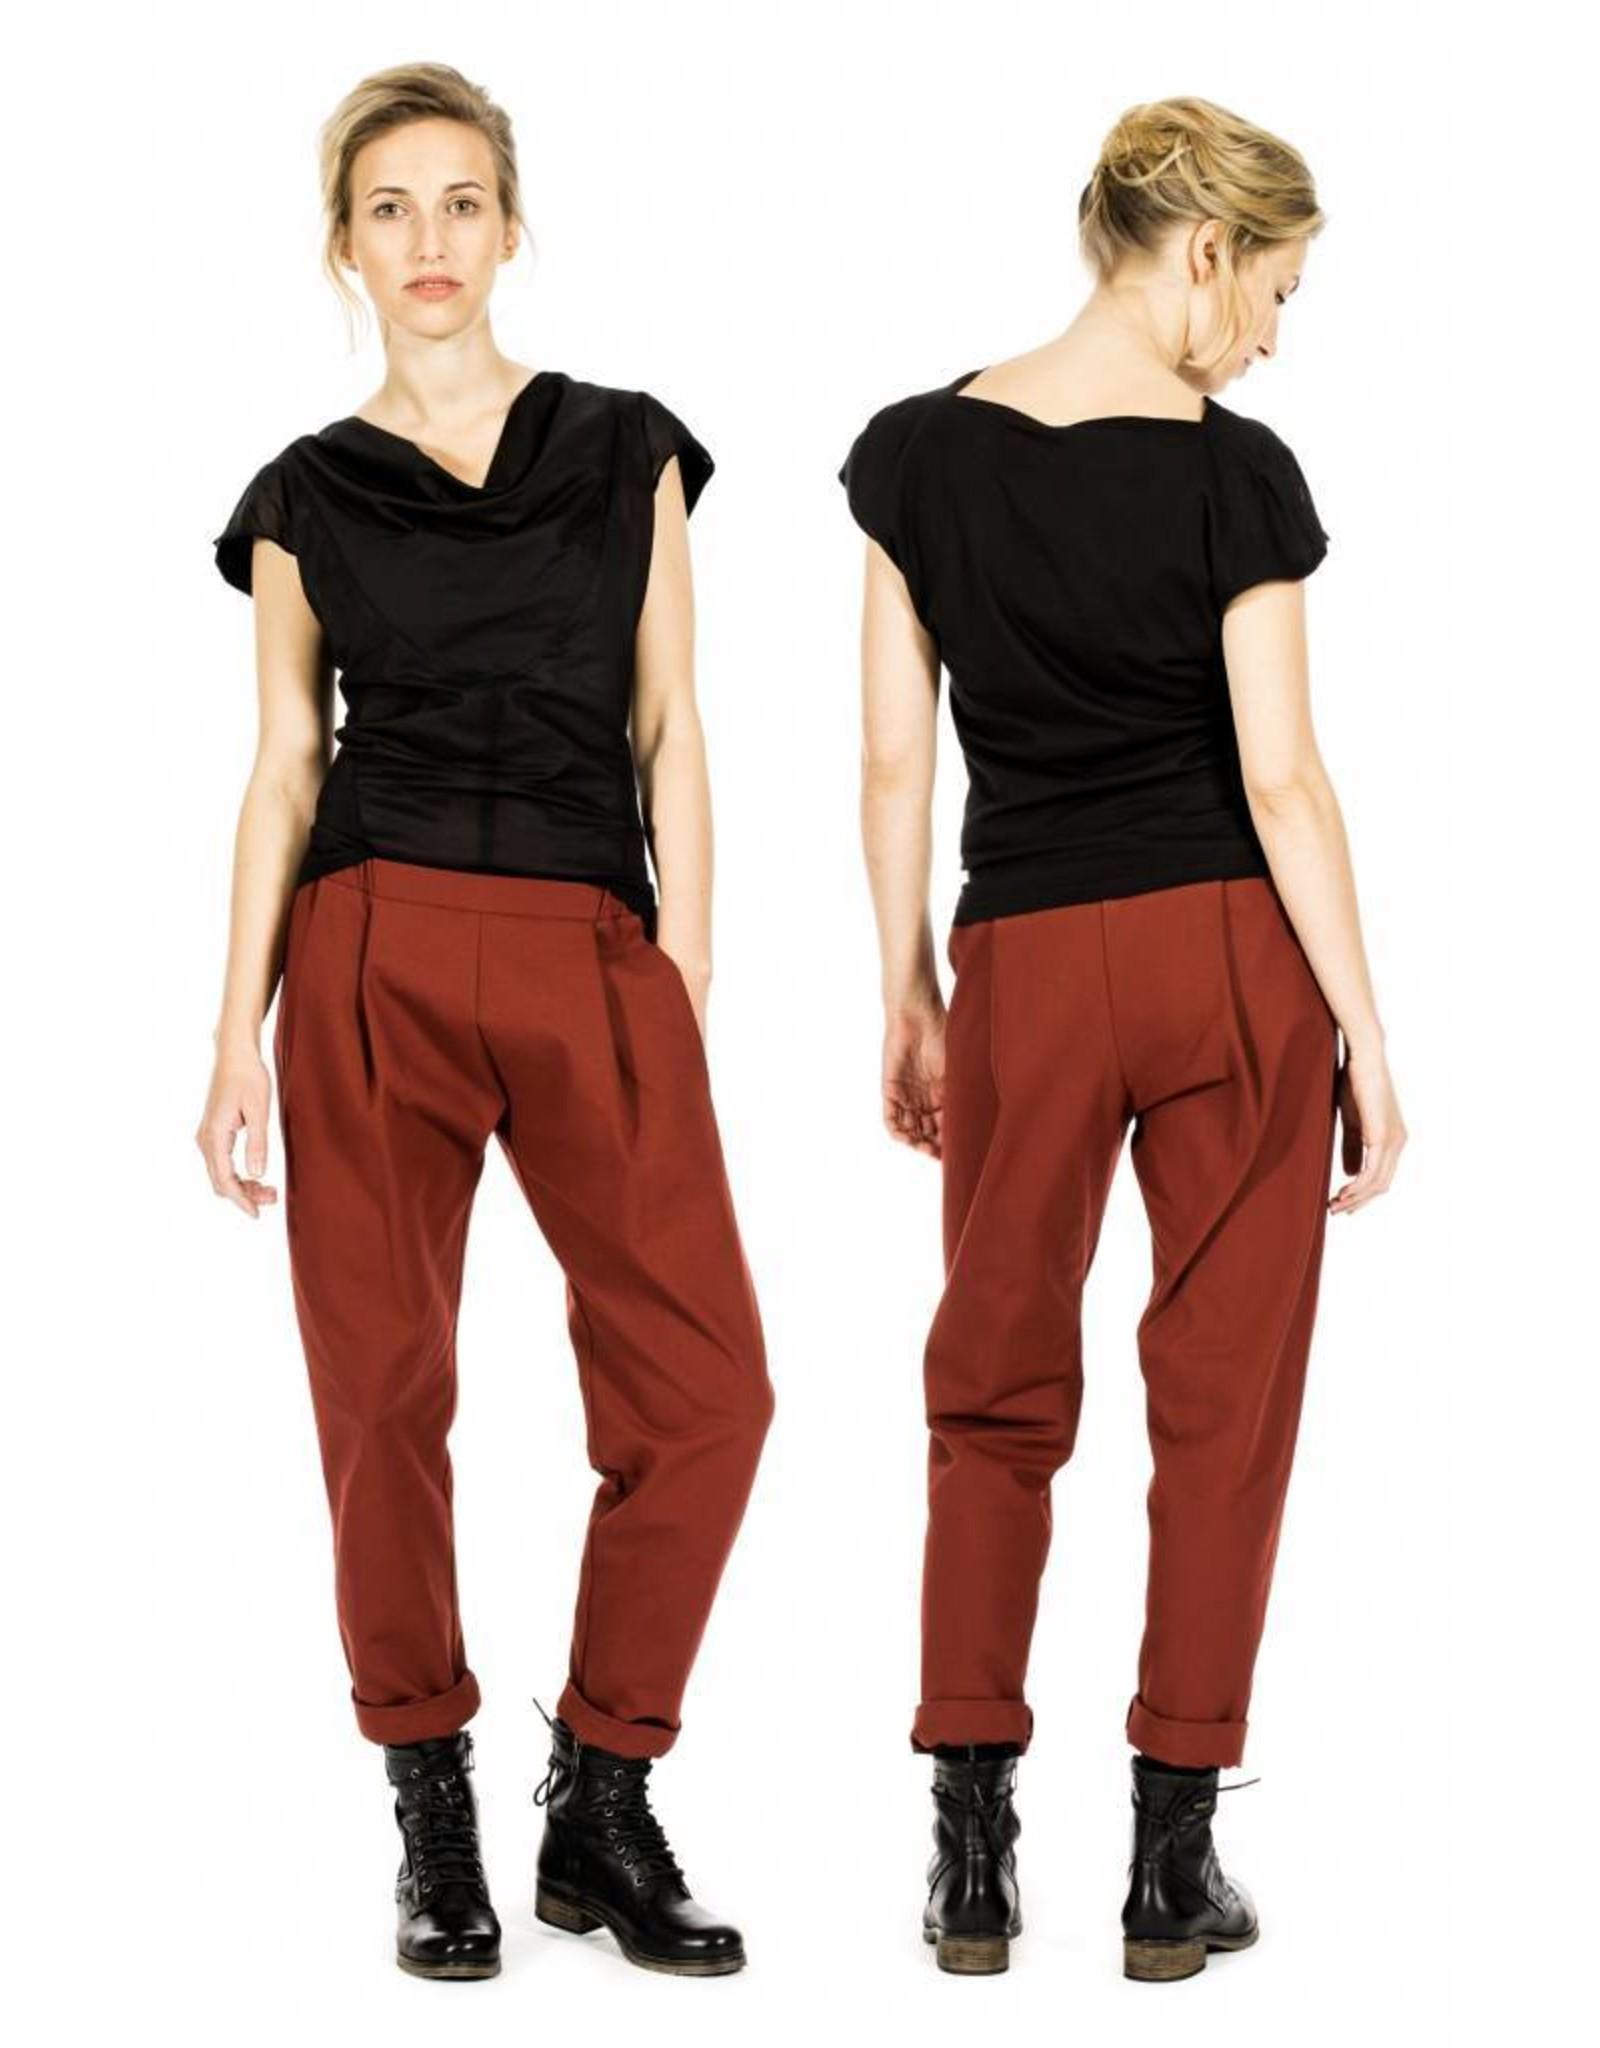 format OATS blouse